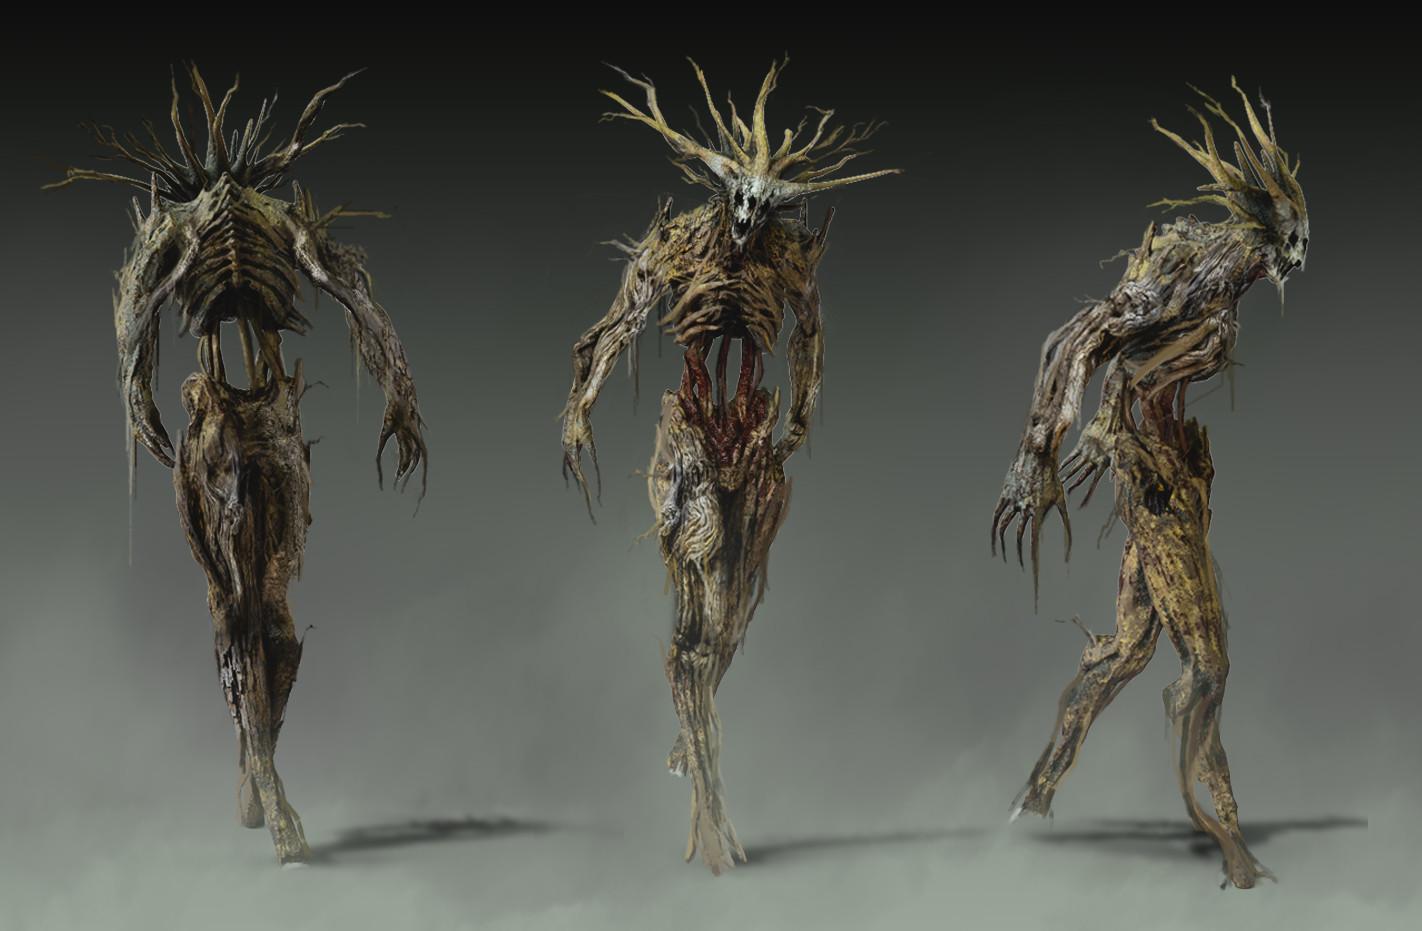 Antonio esparza forest final4